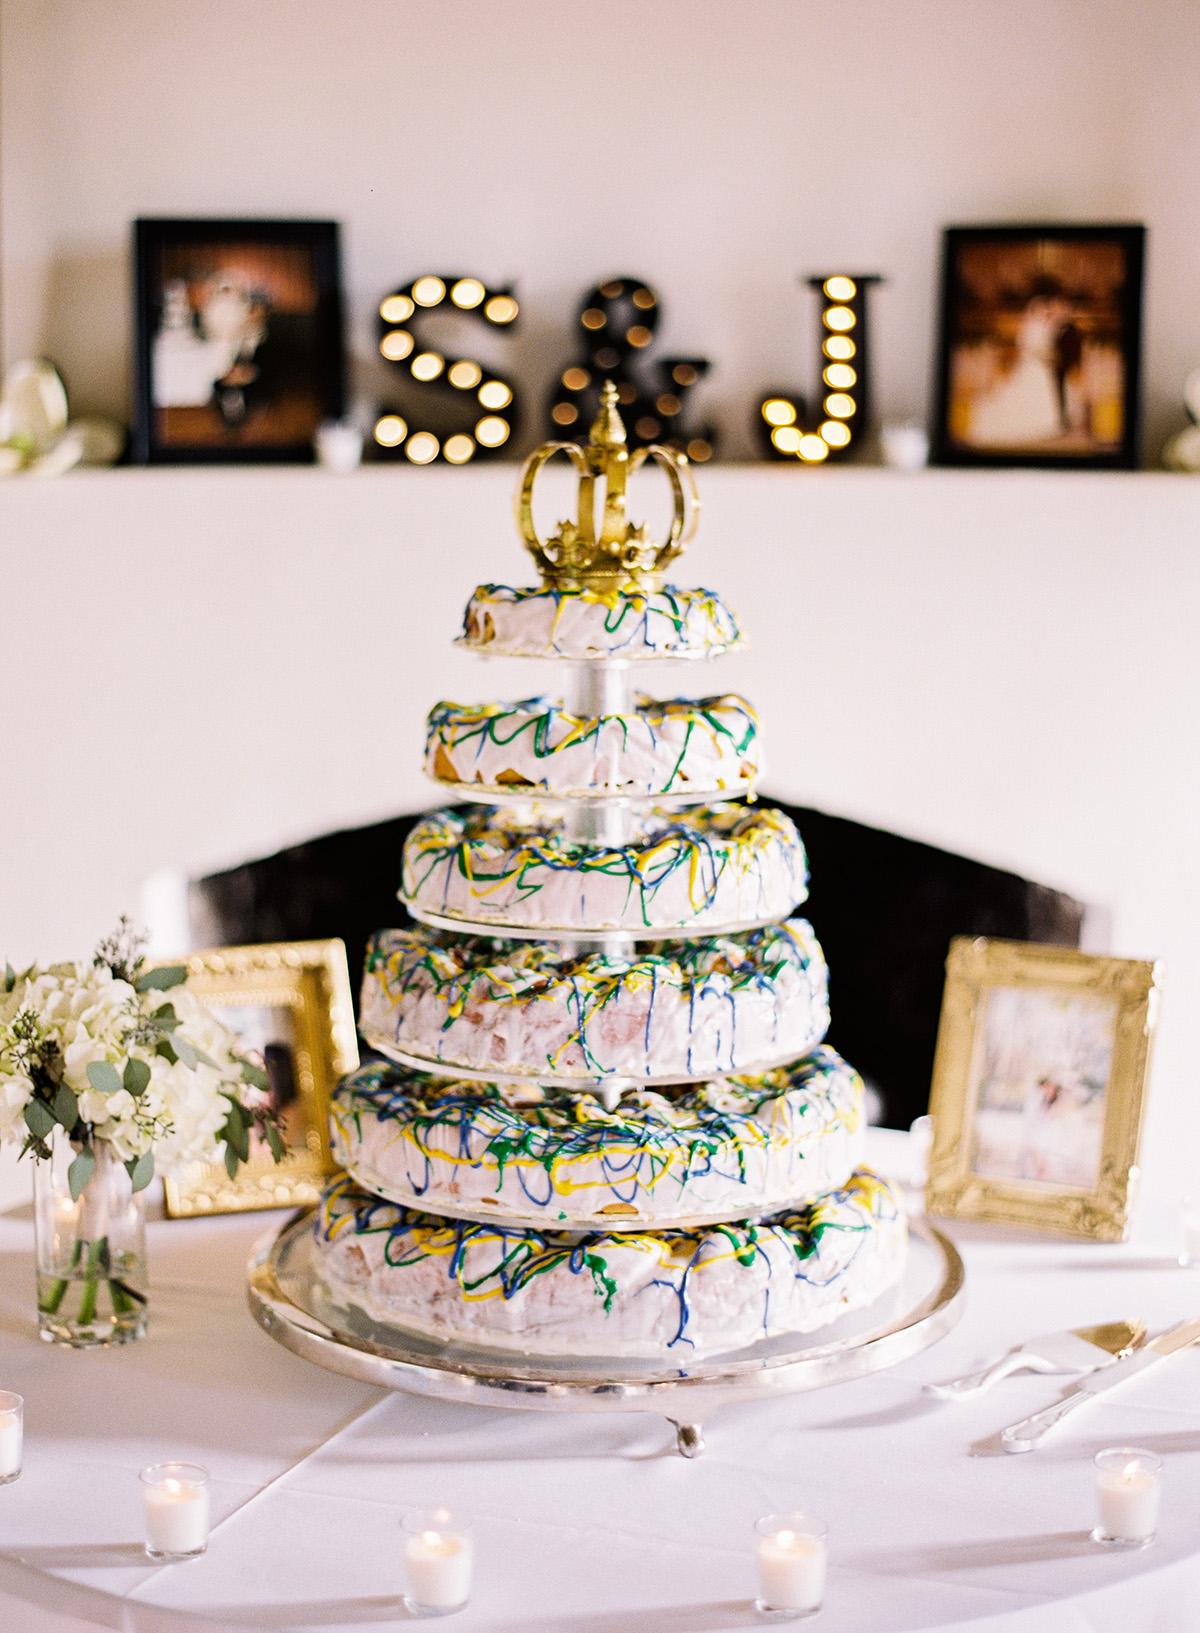 A six tier wedding king cake. Photo: Mon Soleil